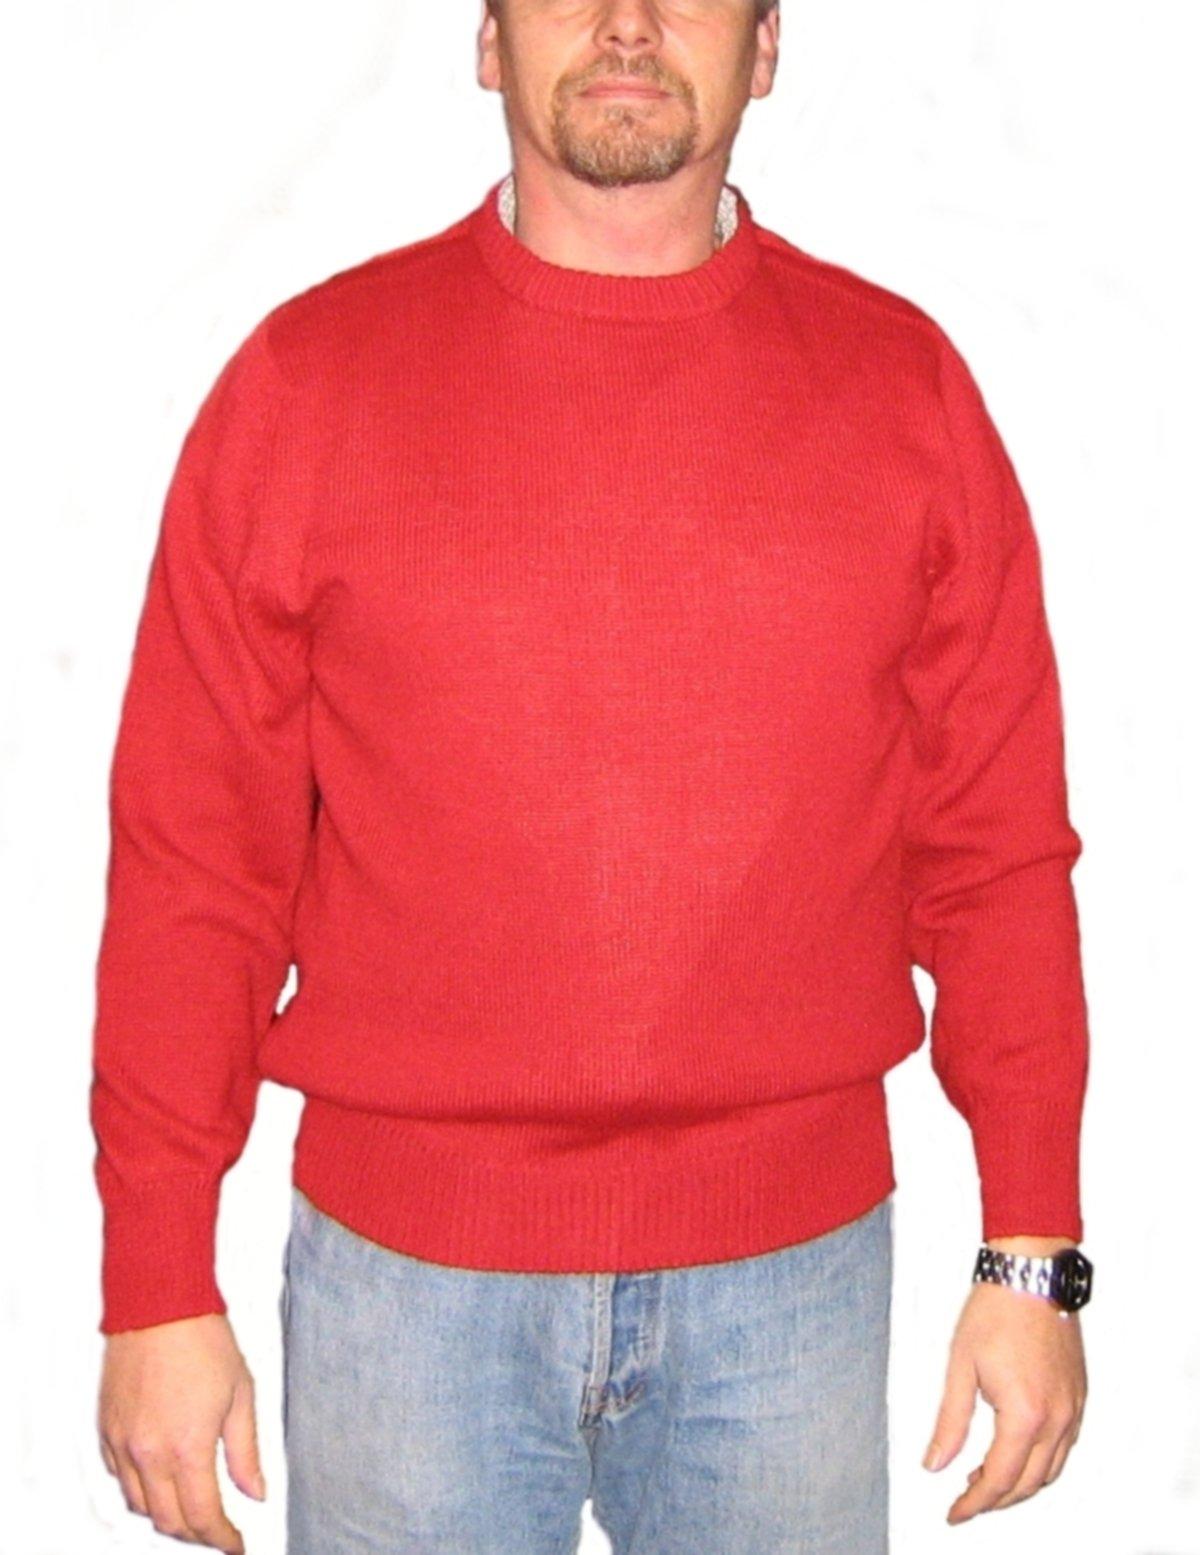 Alpakaandmore Mens 100% Babyalpaca Wool Pullover Red Roundneck (X-Large)